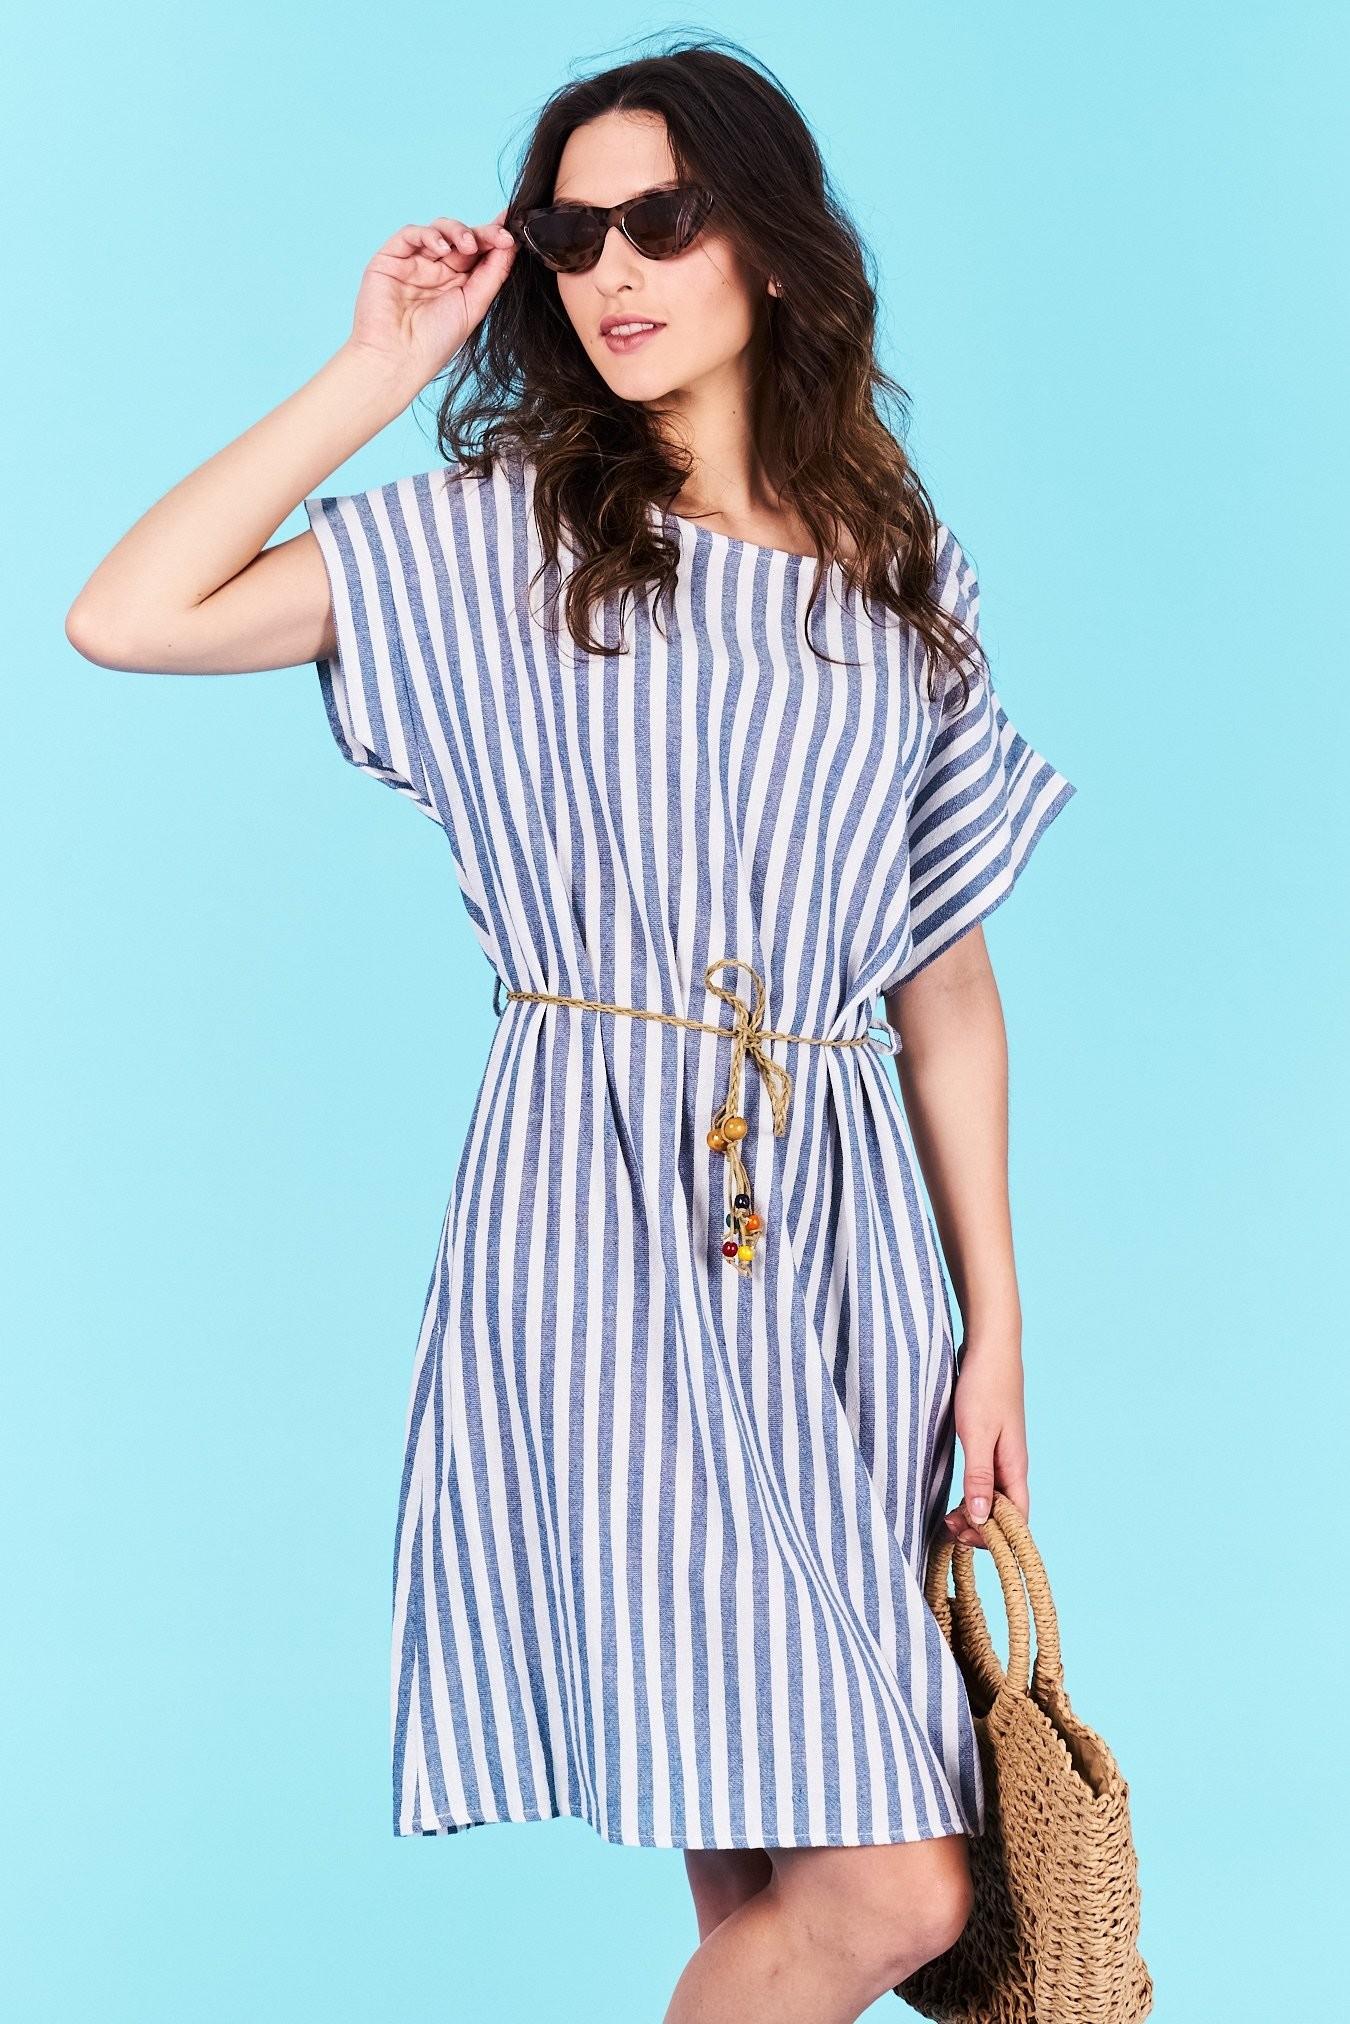 e77b96af0566 Dámske pruhované šaty modré Norah Veľkosť UNI-verzálna Vyrobené z  príjemného materiálu. Pohodlné šaty